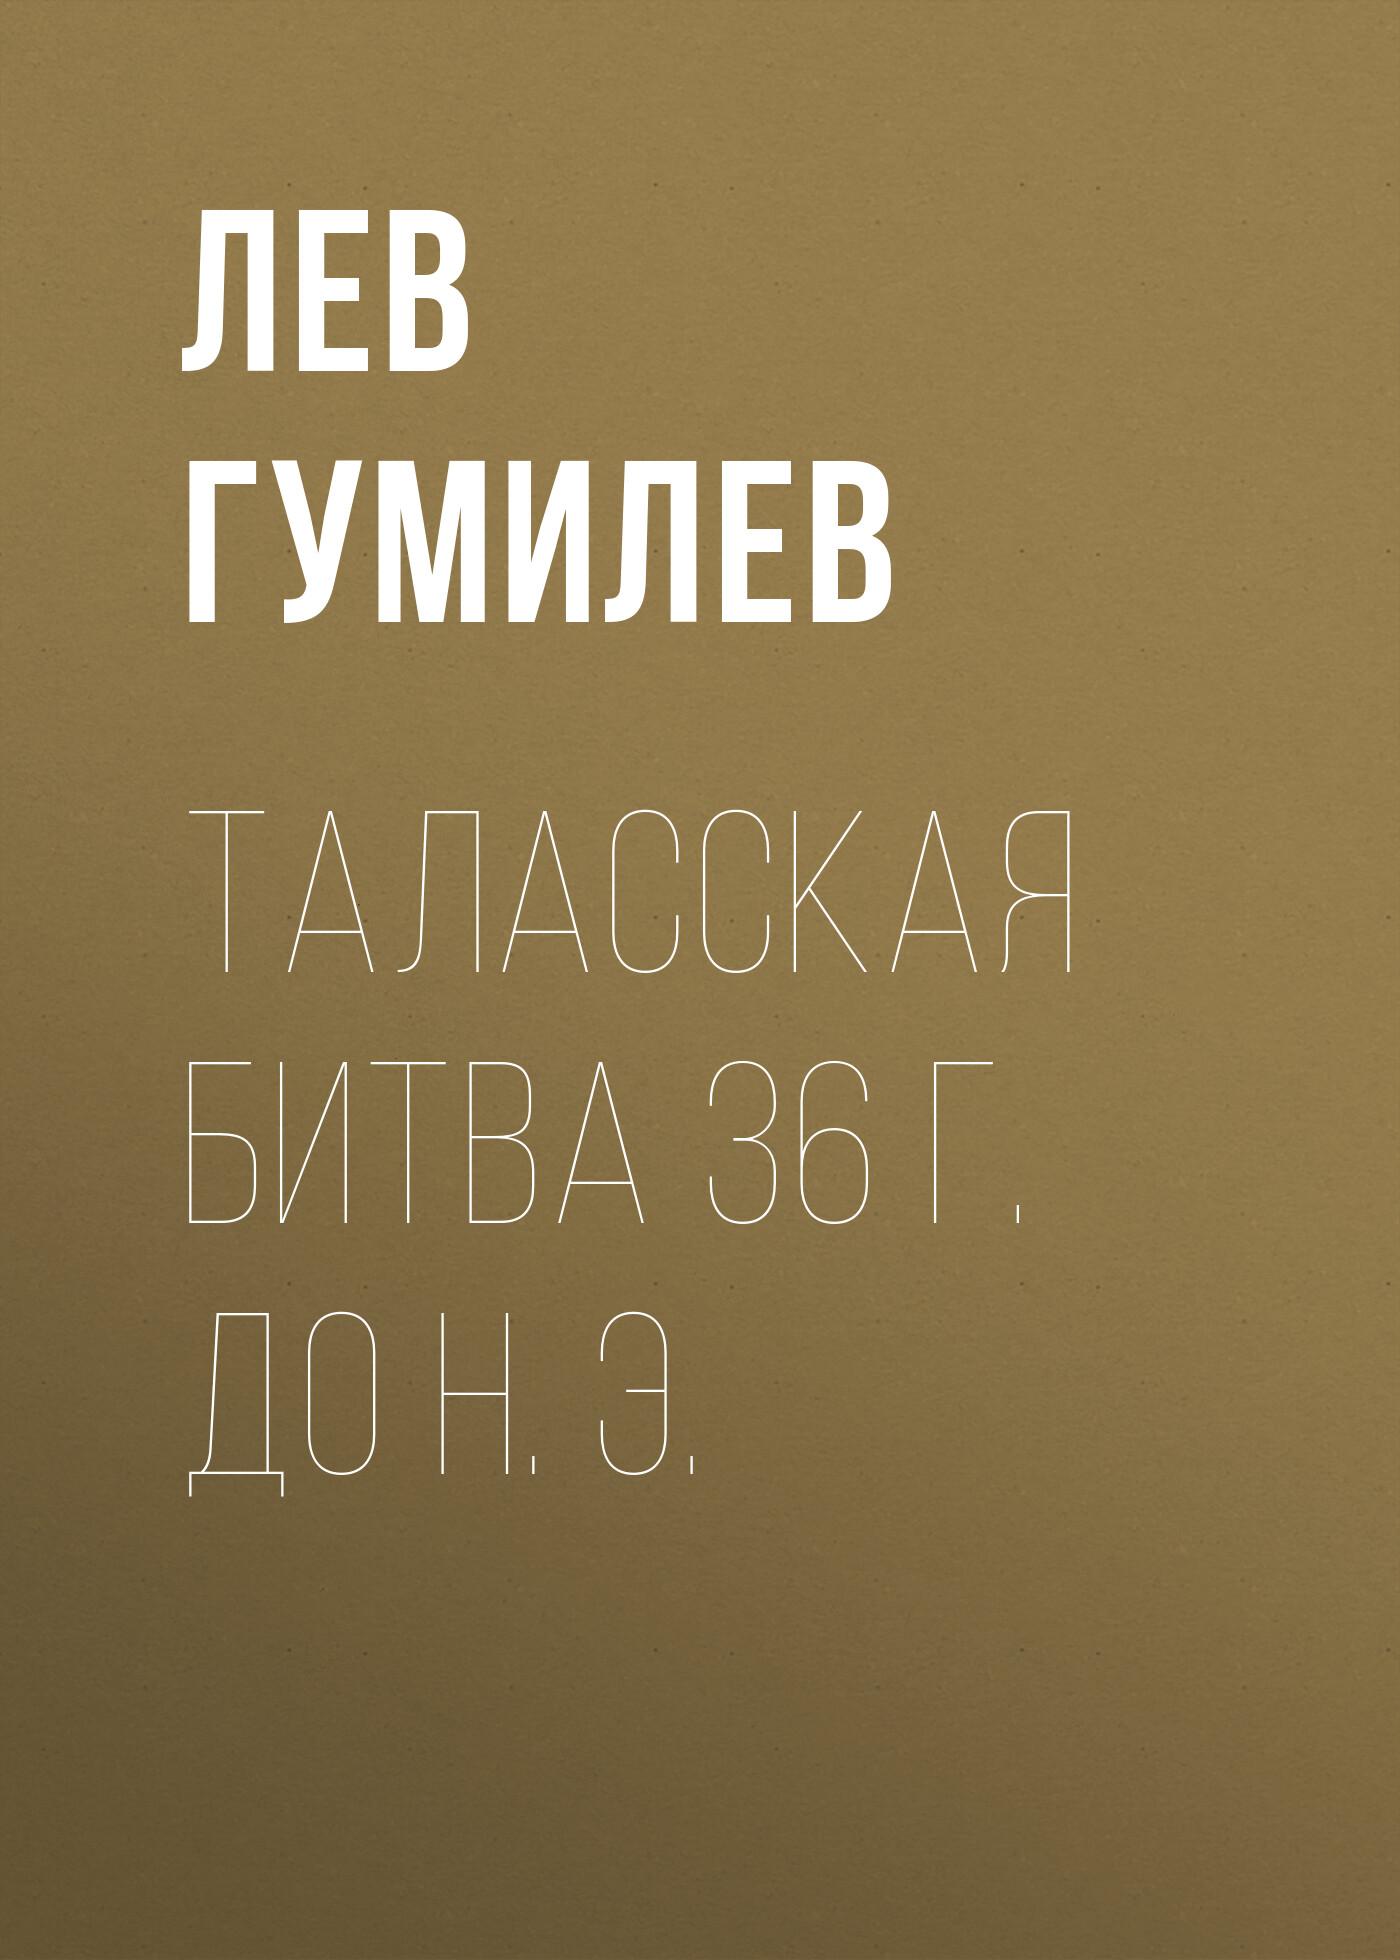 Лев Гумилев Таласская битва 36 г. до н. э.